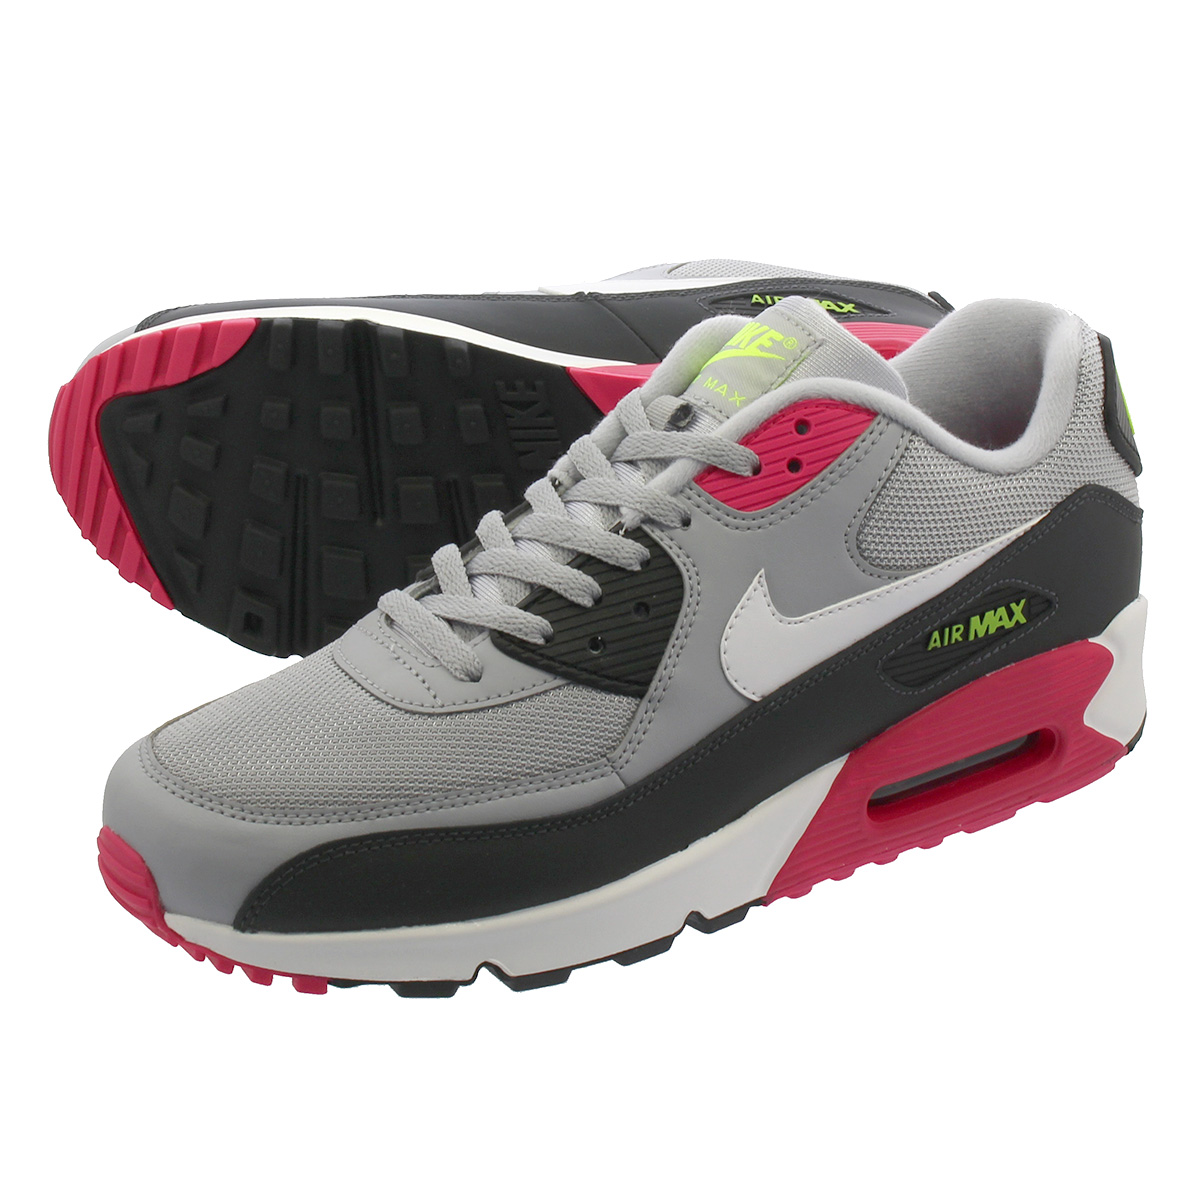 Nike Air Max 90 Essential (Cool GreyVolt) Sneaker Freaker